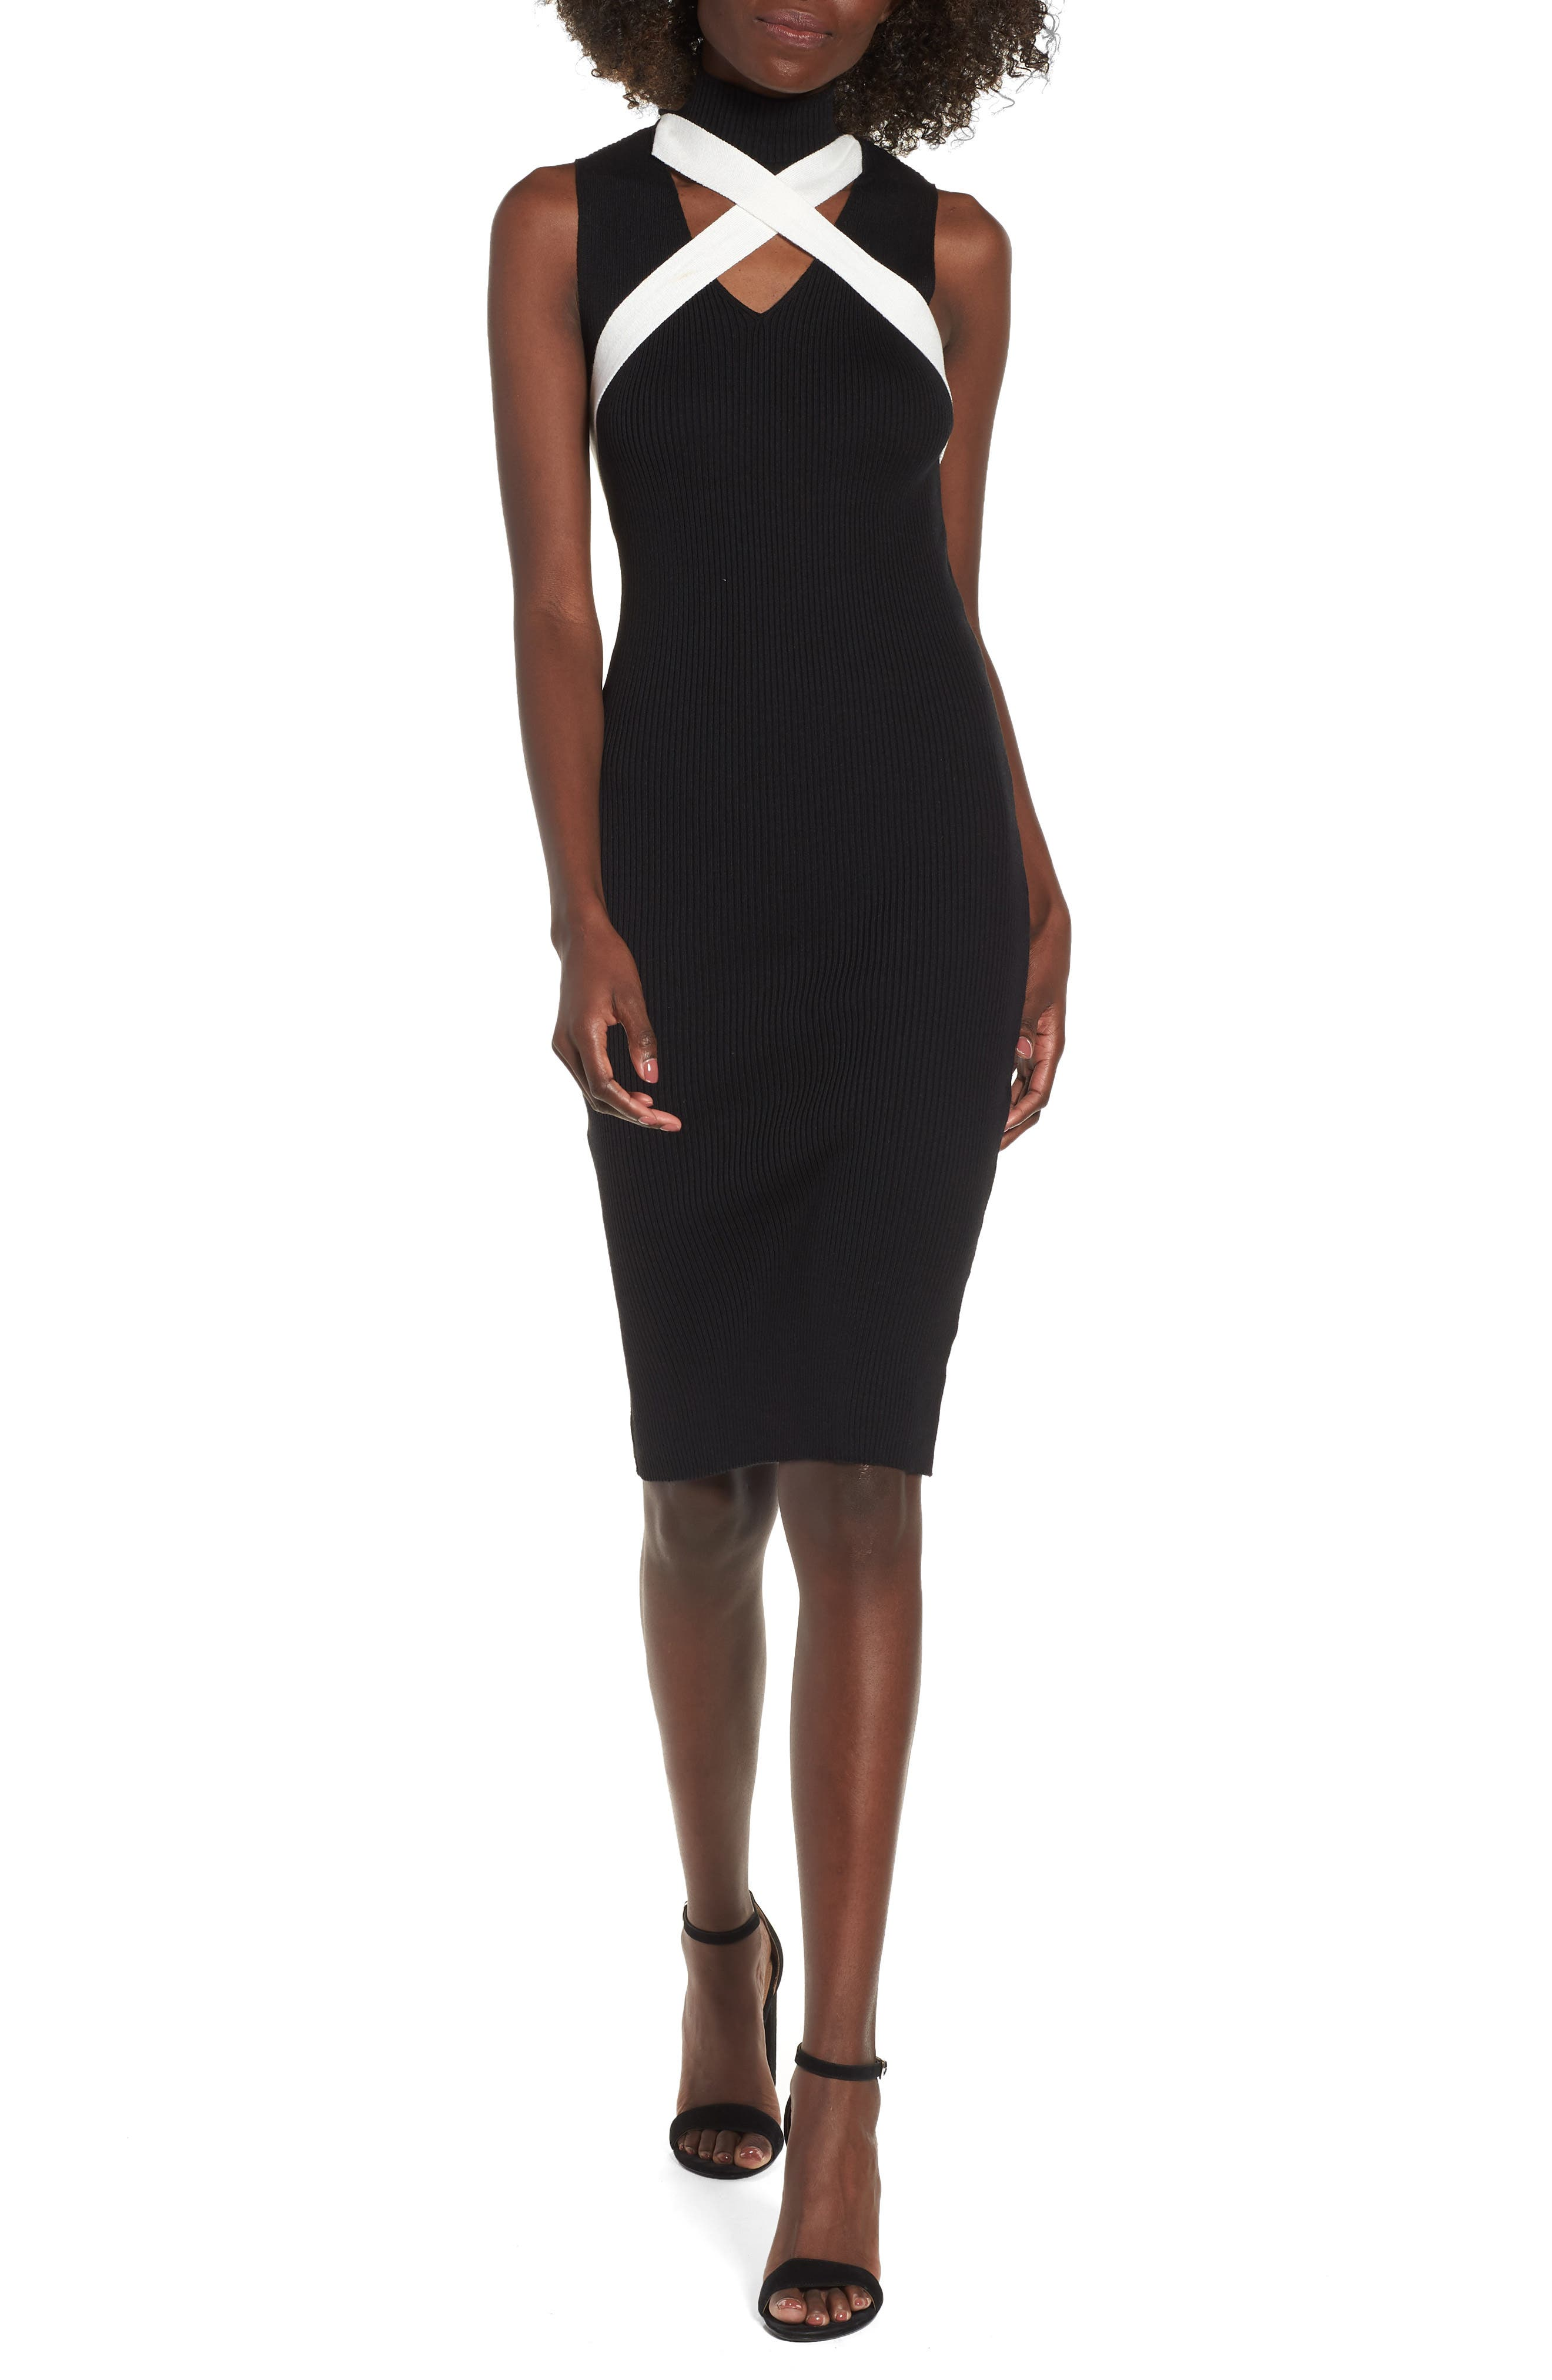 Main Image - LOST INK Crisscross Body-Con Dress